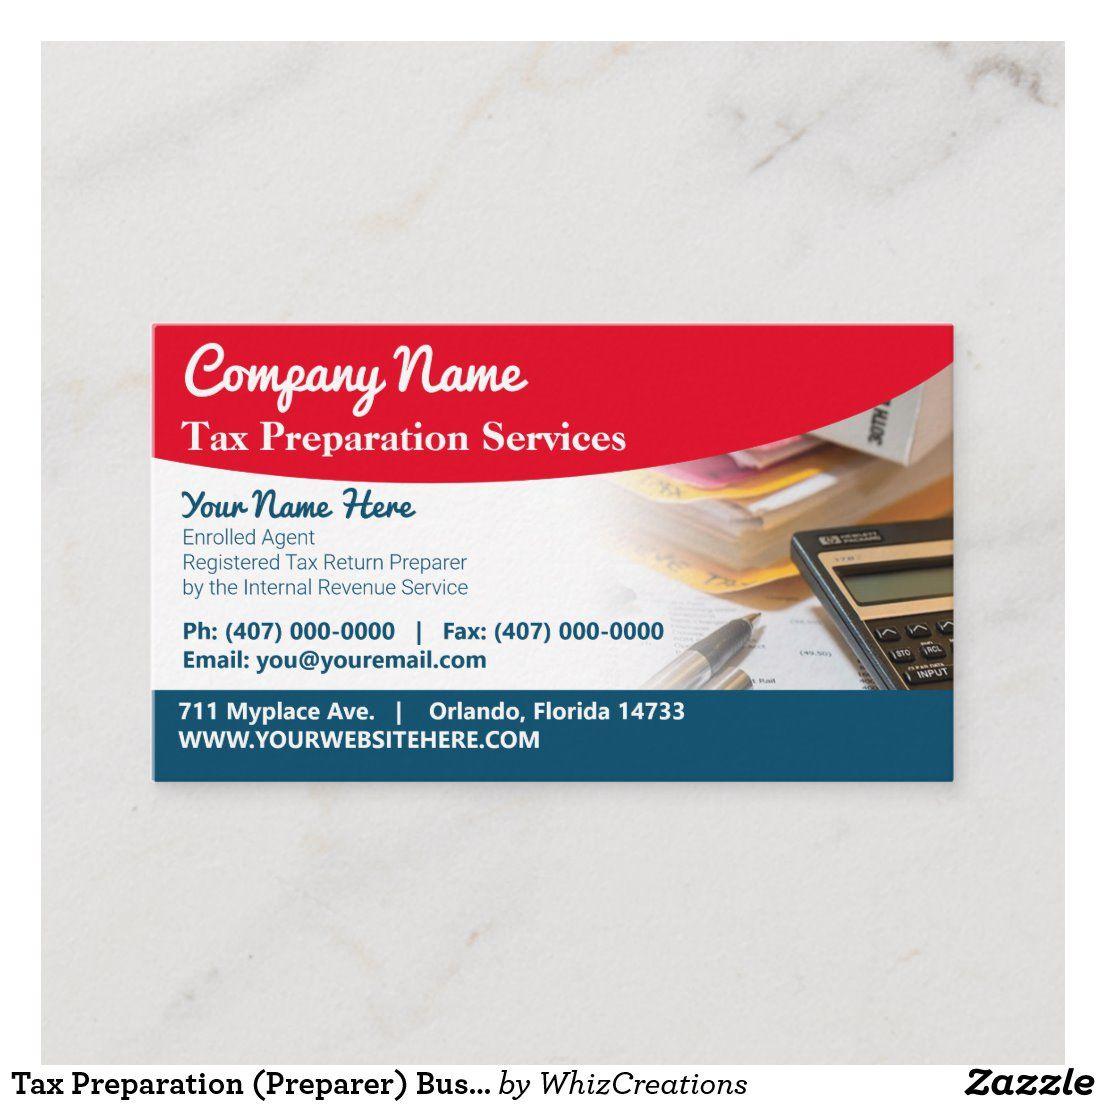 Tax Preparation Preparer Business Card Zazzle Com Tax Preparation Printing Double Sided Business Cards